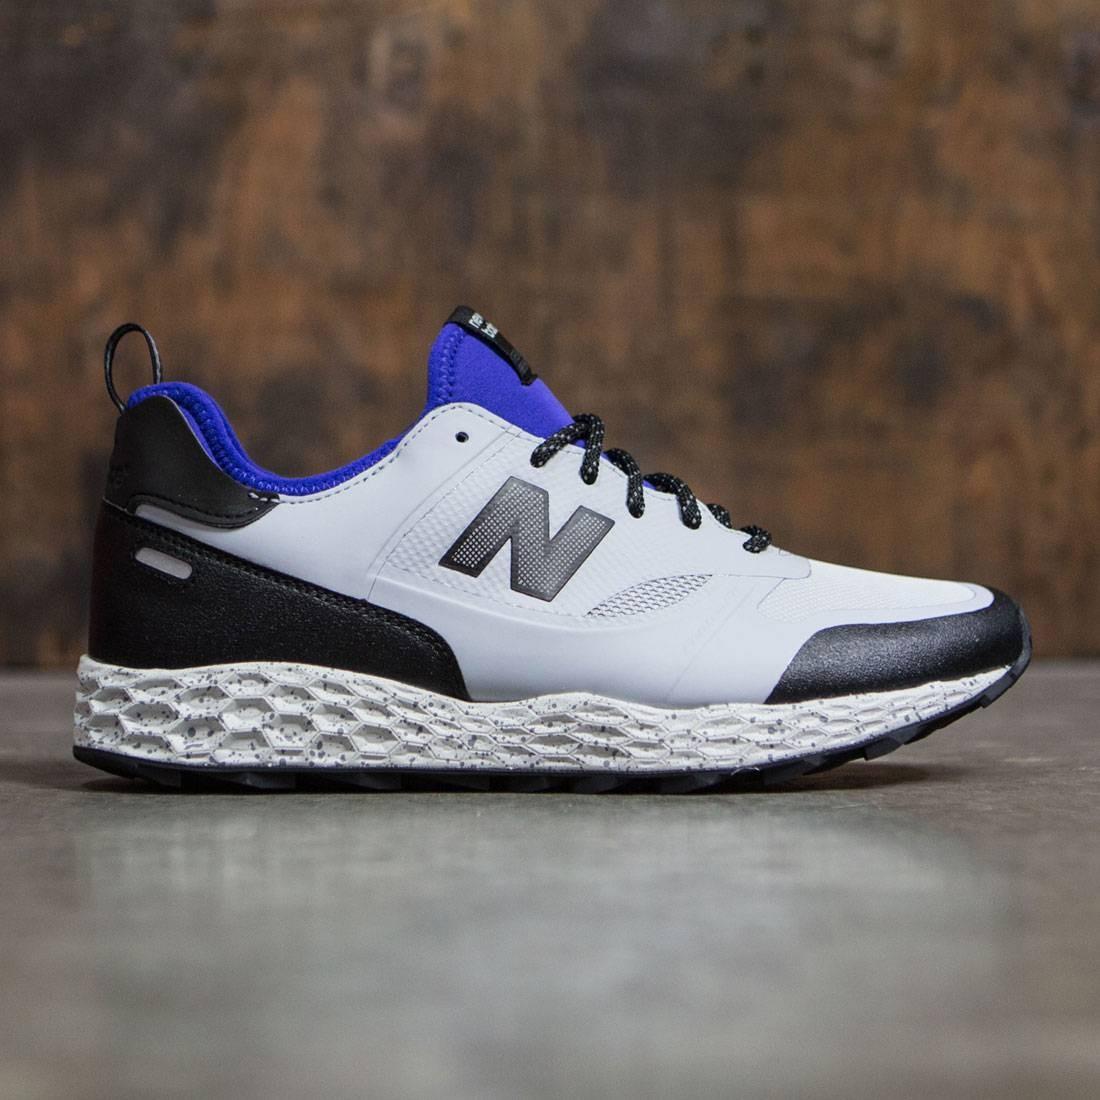 New Balance Fresh Foam Trailbuster Shoe